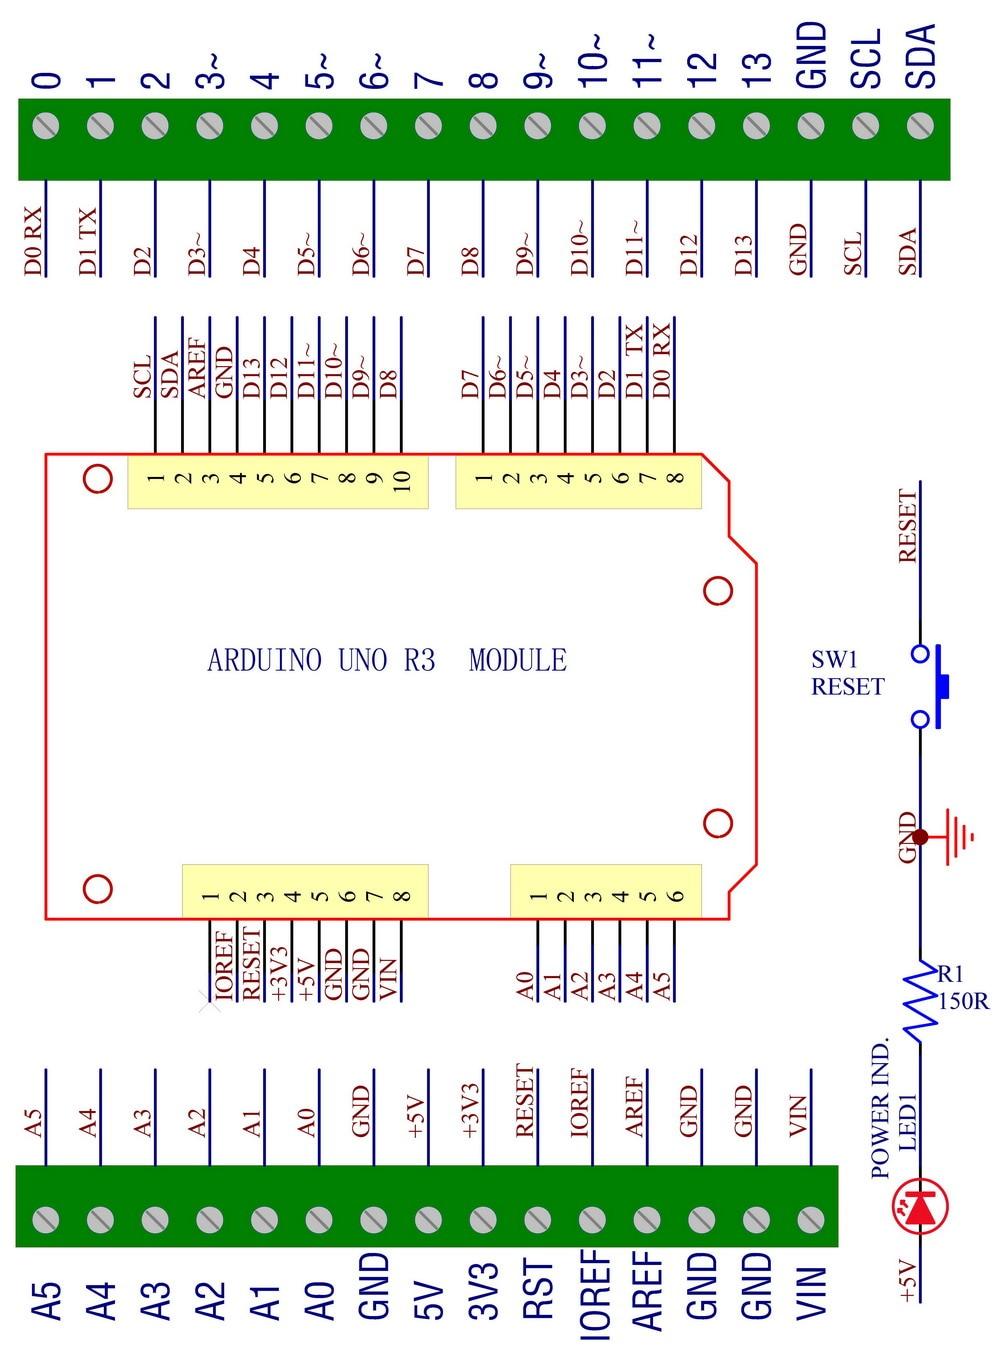 condutor de fio de cobre 2 3 4 5 6 7 8 10 12 14 16 nucleos pinos rvv 06